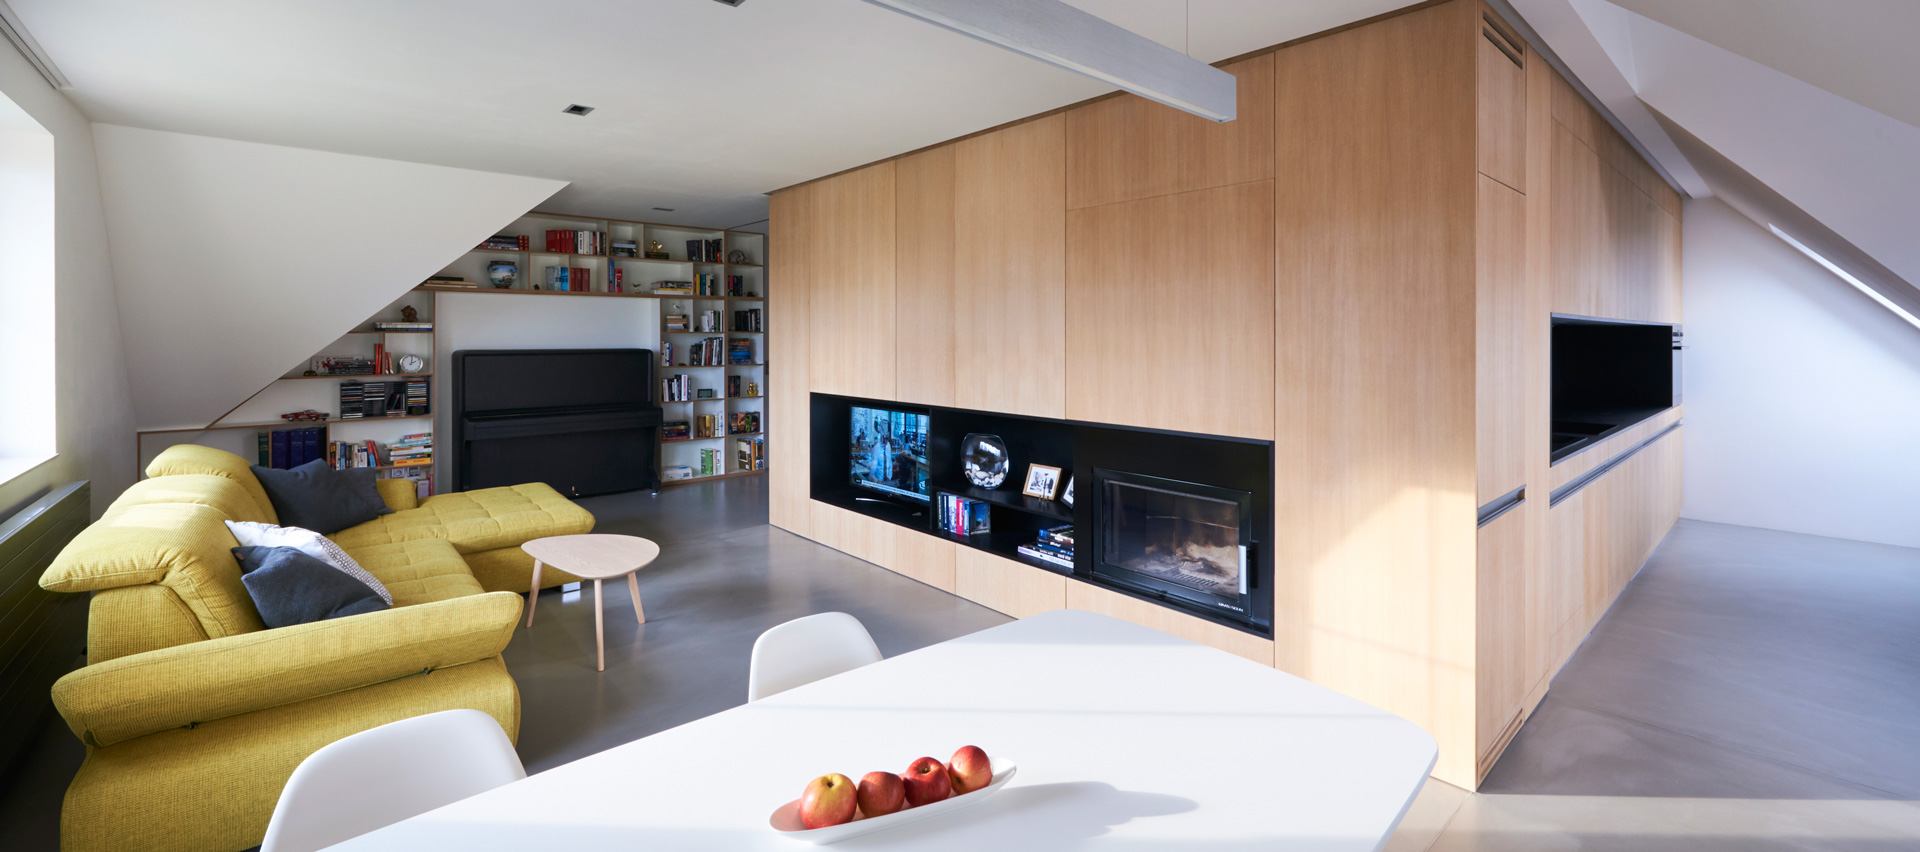 Josef-Cerny-architektonicka-a-projekcni-kancelar-slide-2